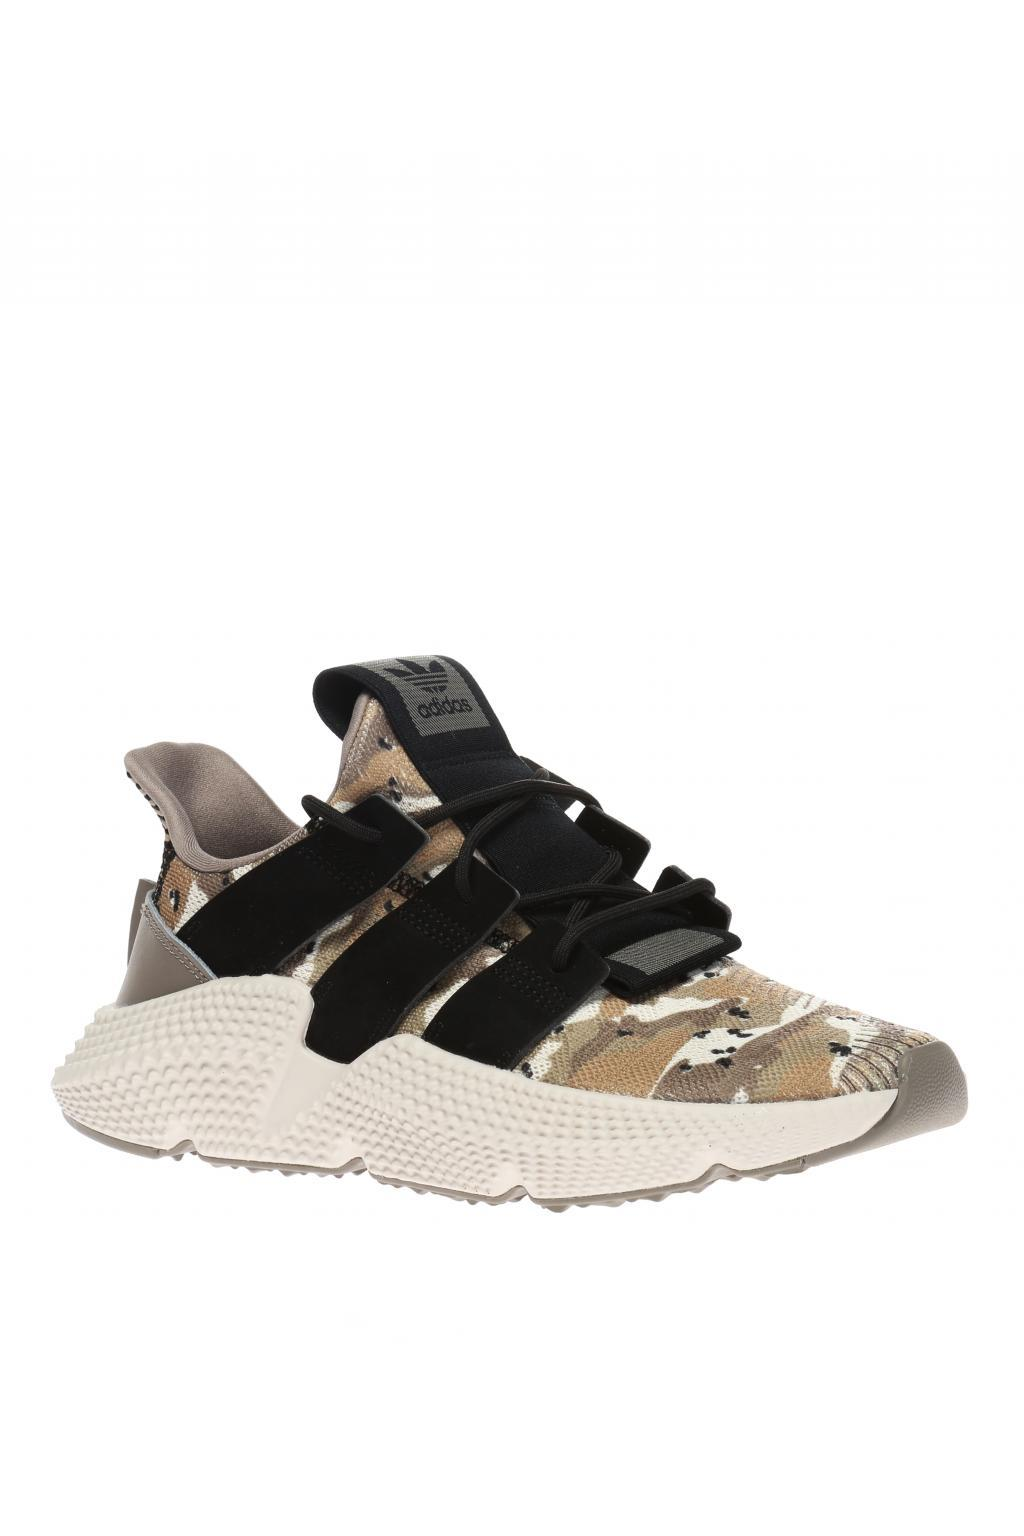 san francisco 953e1 90f7f Adidas Originals - Brown  prophere  Sneakers for Men - Lyst. View fullscreen